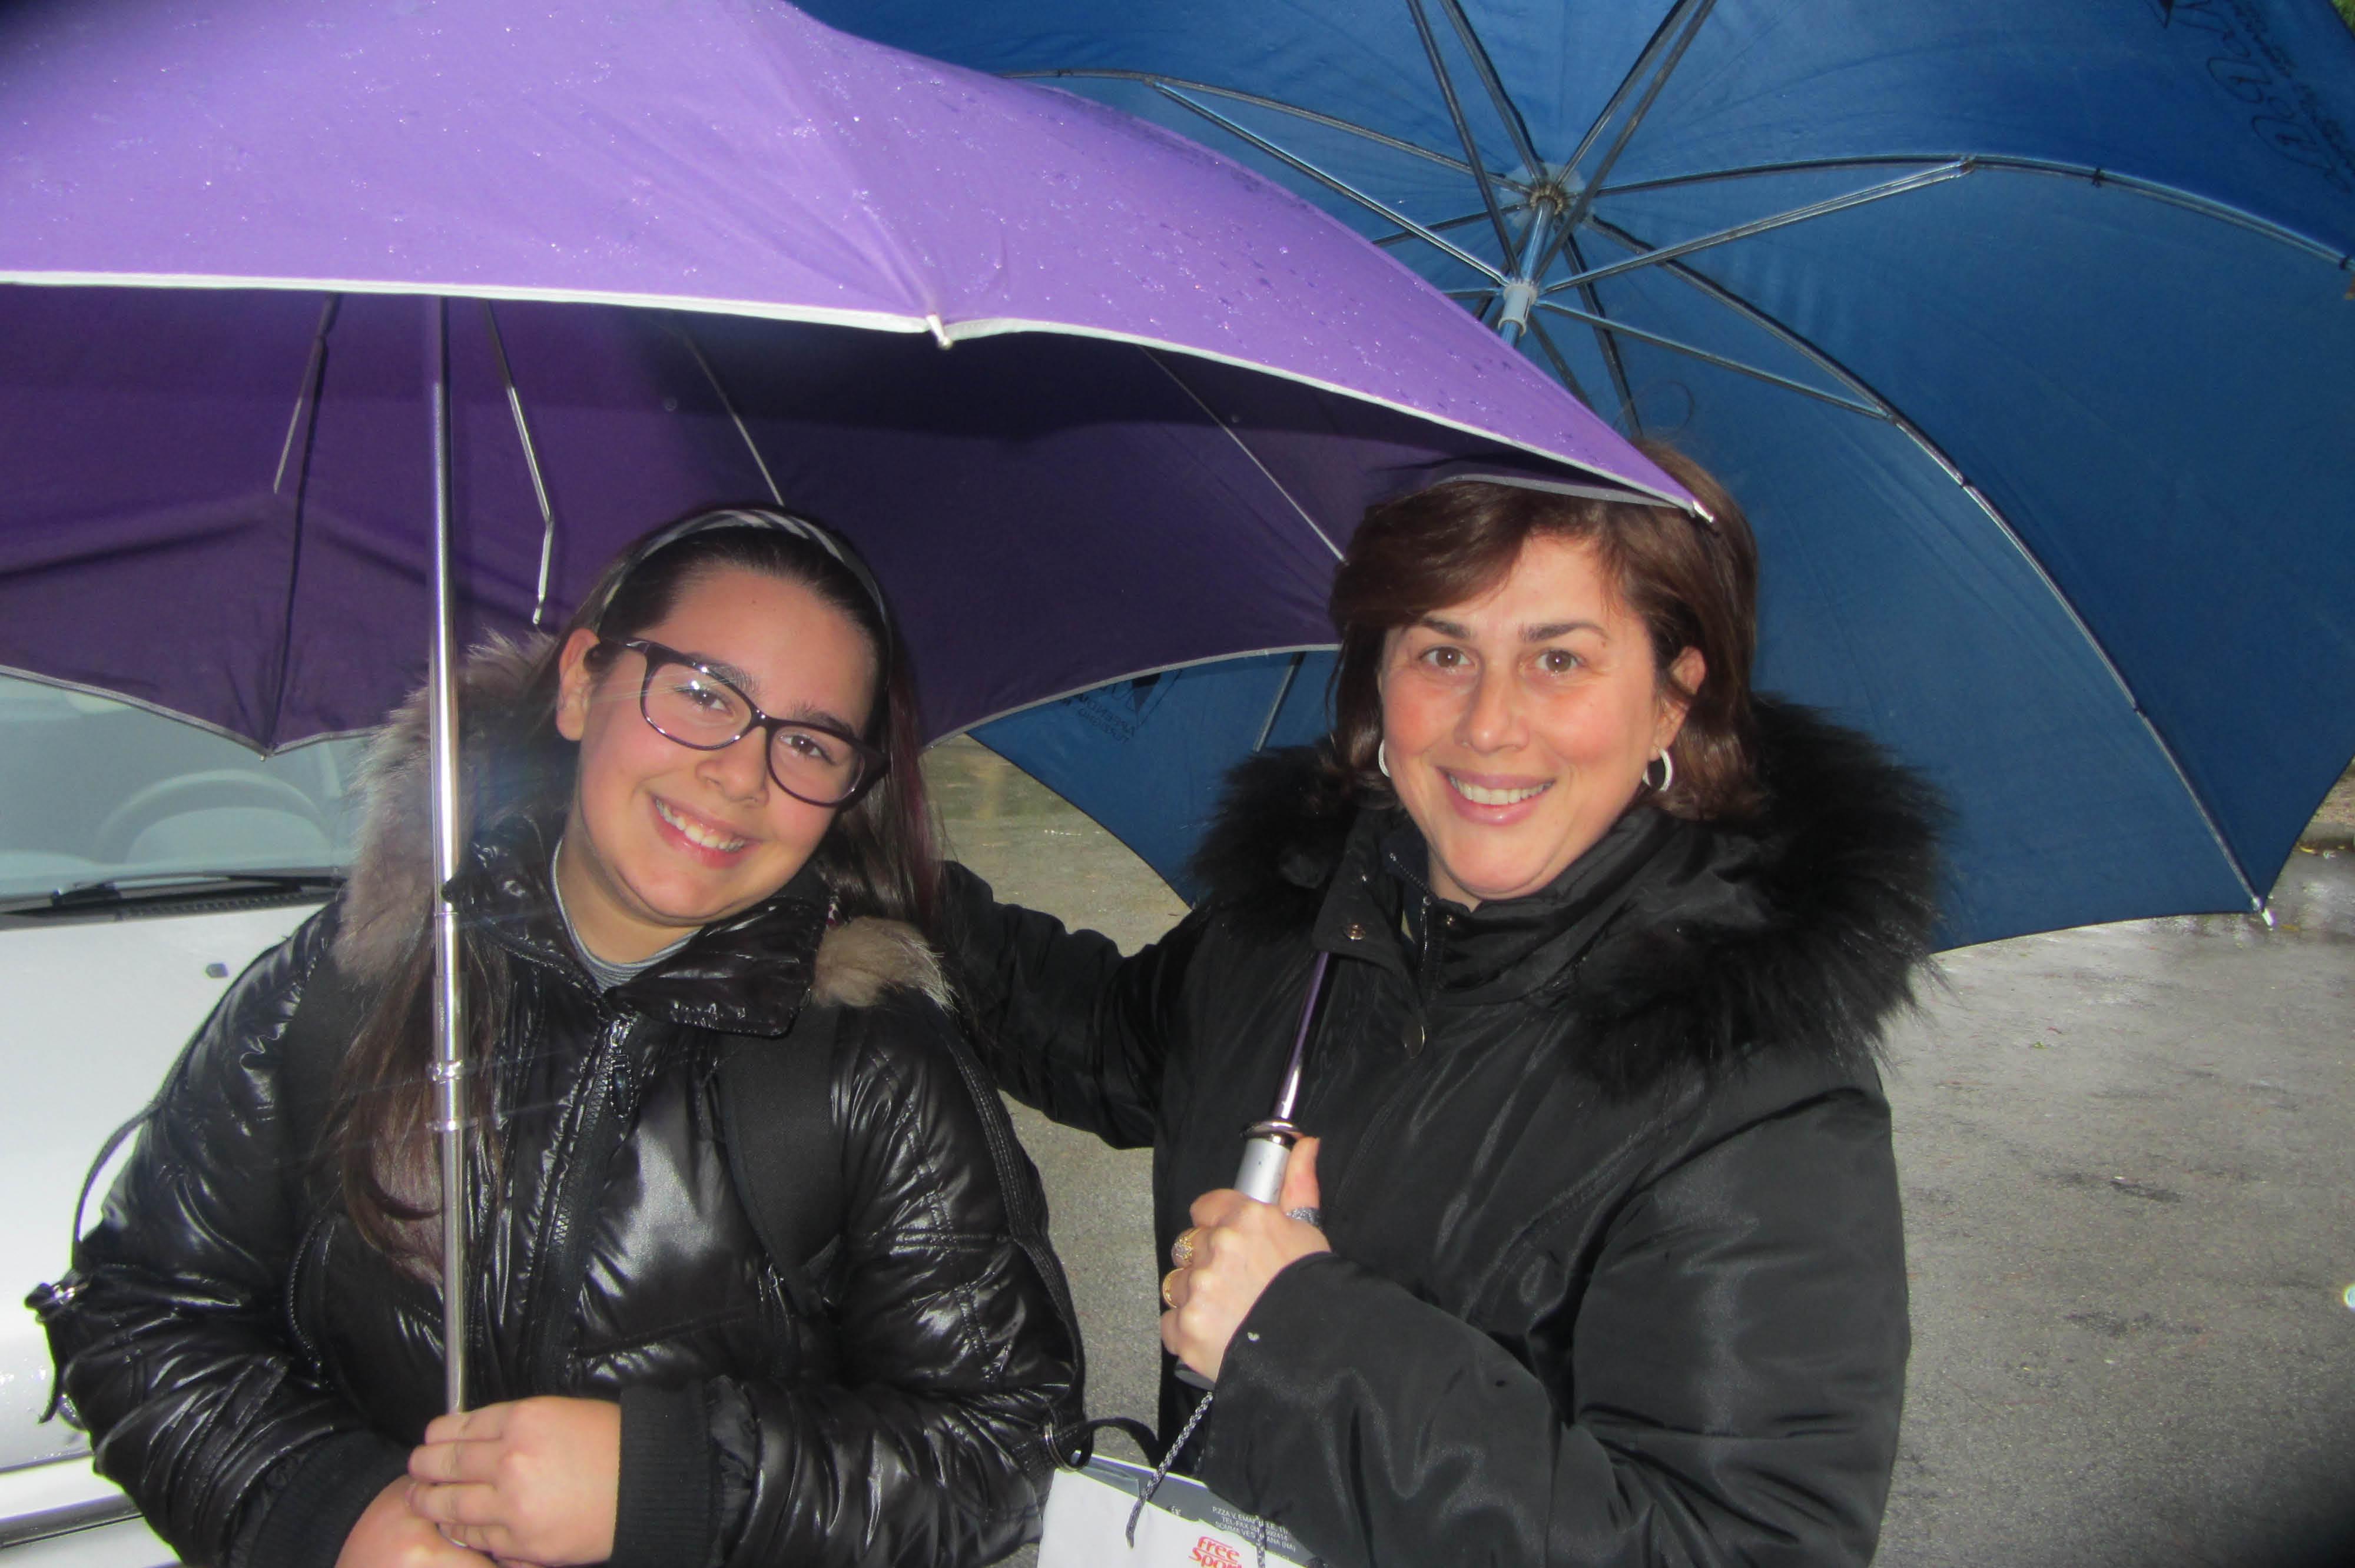 Benedict School Pomigliano d'Arco @ Somma38